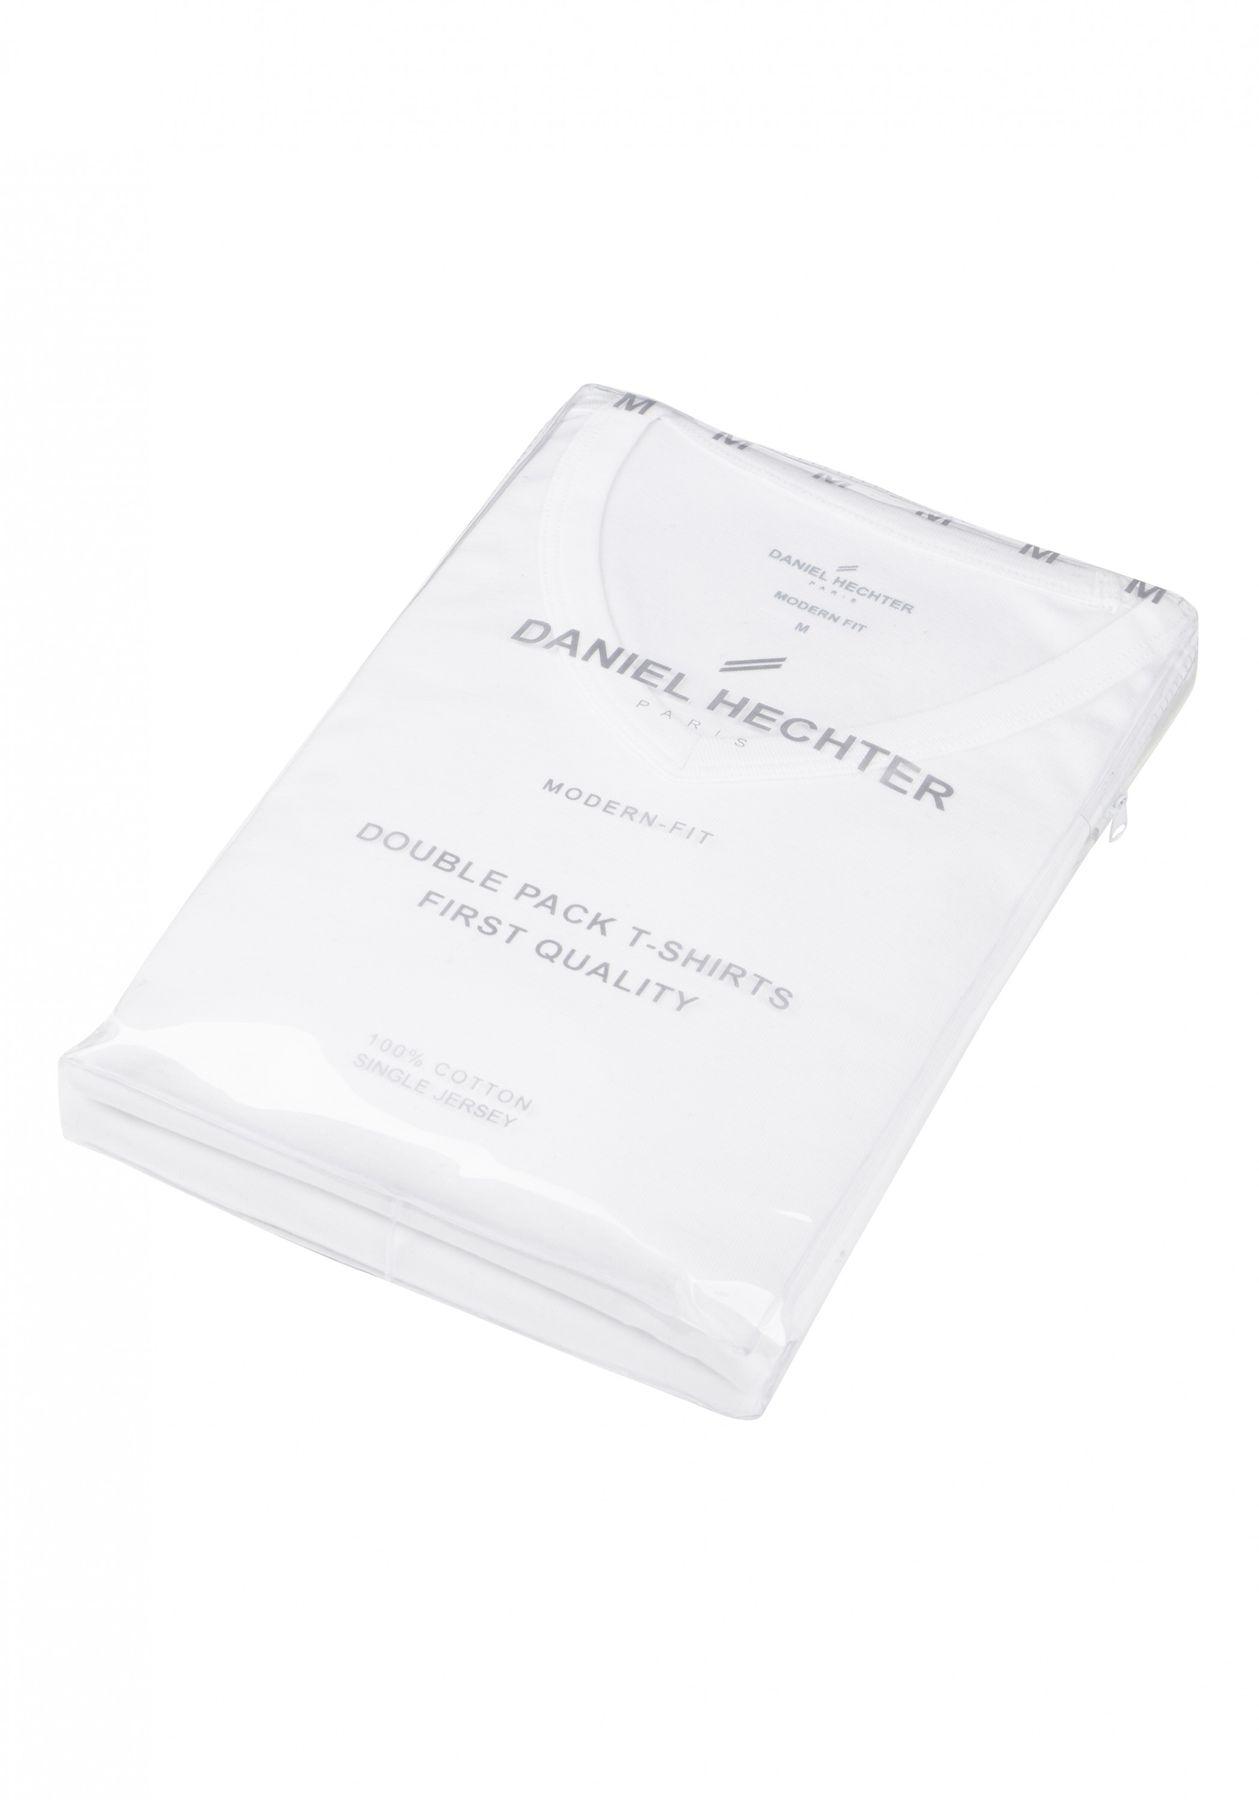 Daniel Hechter - Modern Fit -  Doppelpack Herren Kurzarm T-Shirt in weiß, S-3XL (474 10289) – Bild 3